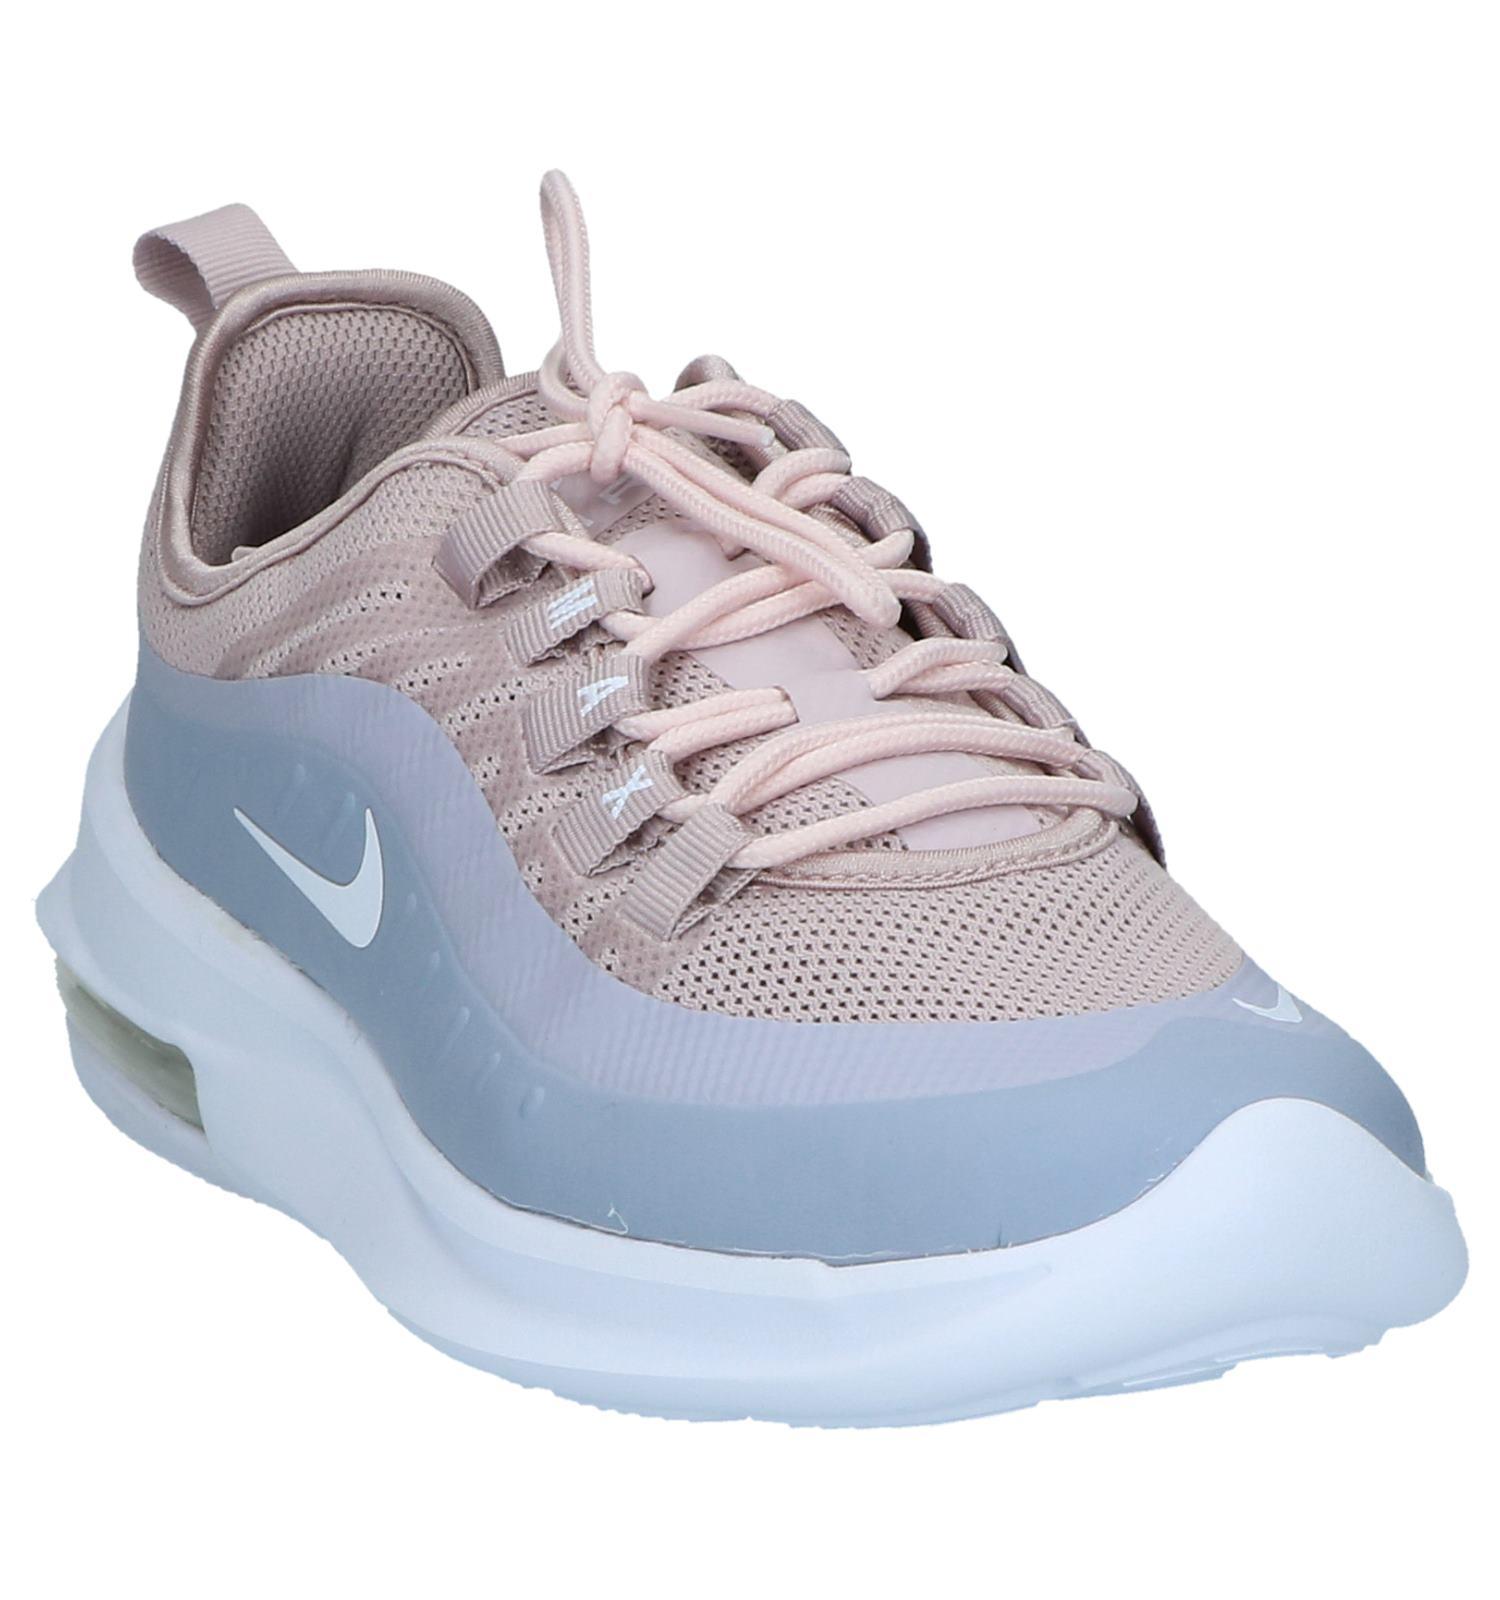 6a6b8663091 Roze Runner Sneakers Nike Air Max Axis   TORFS.BE   Gratis verzend en retour